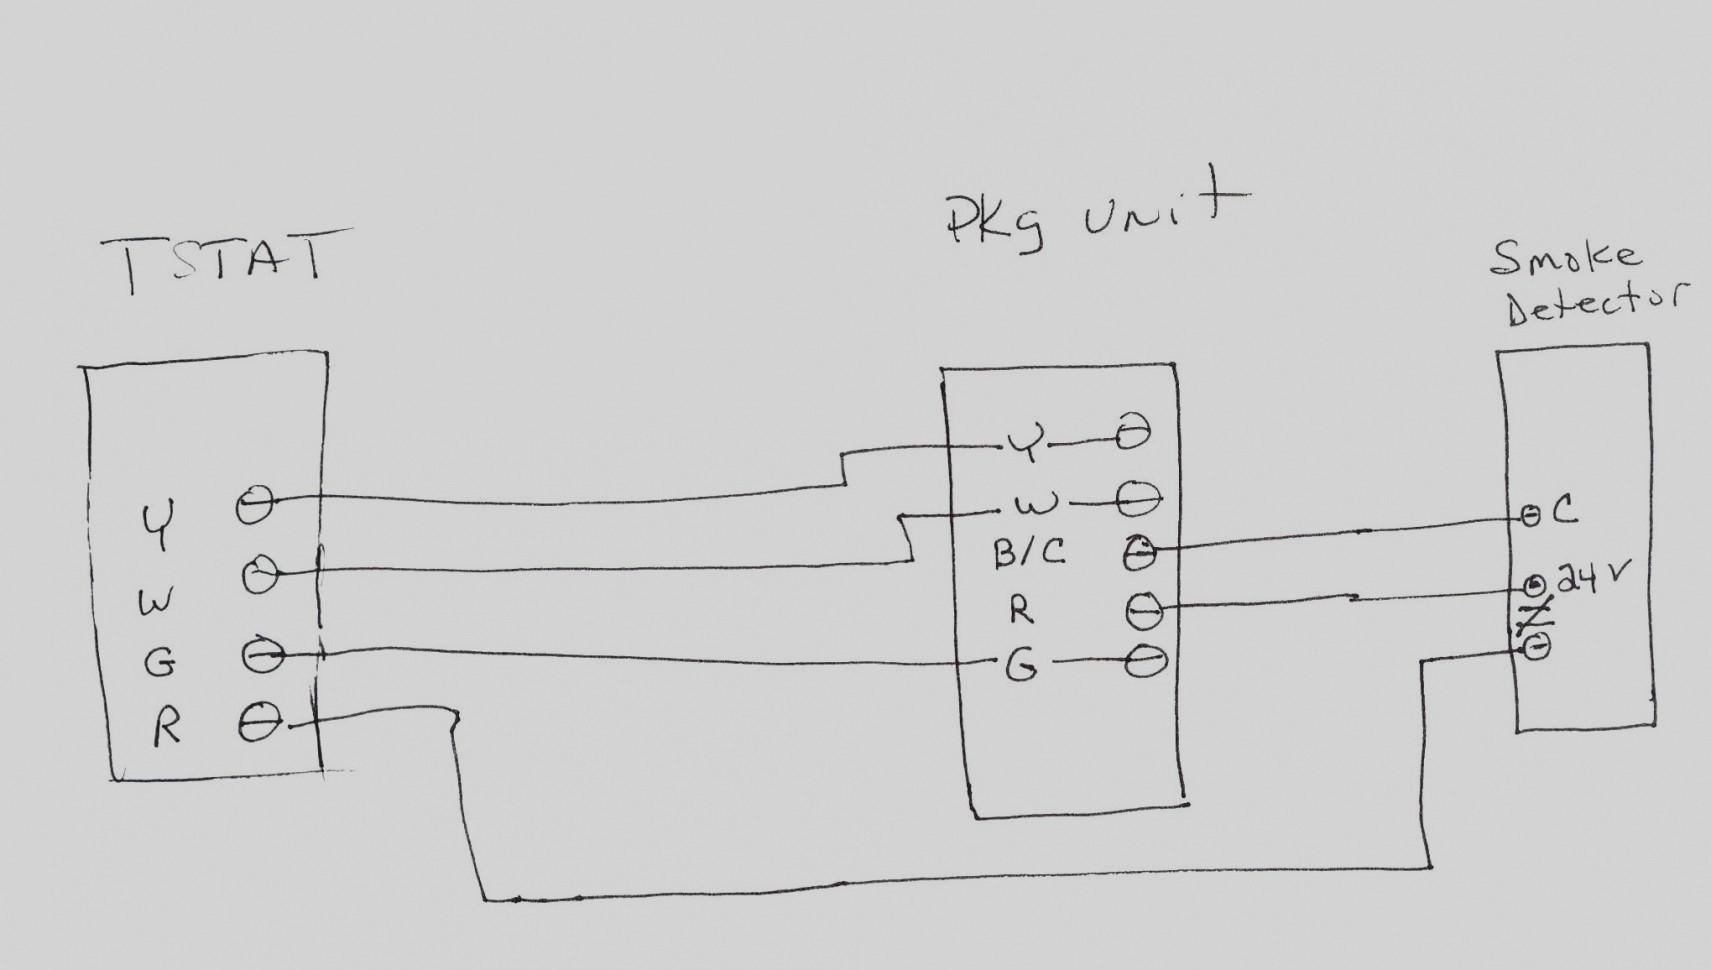 2Wire Smoke Detector Wiring Diagram | Wiring Diagram - 2 Wire Smoke Detector Wiring Diagram